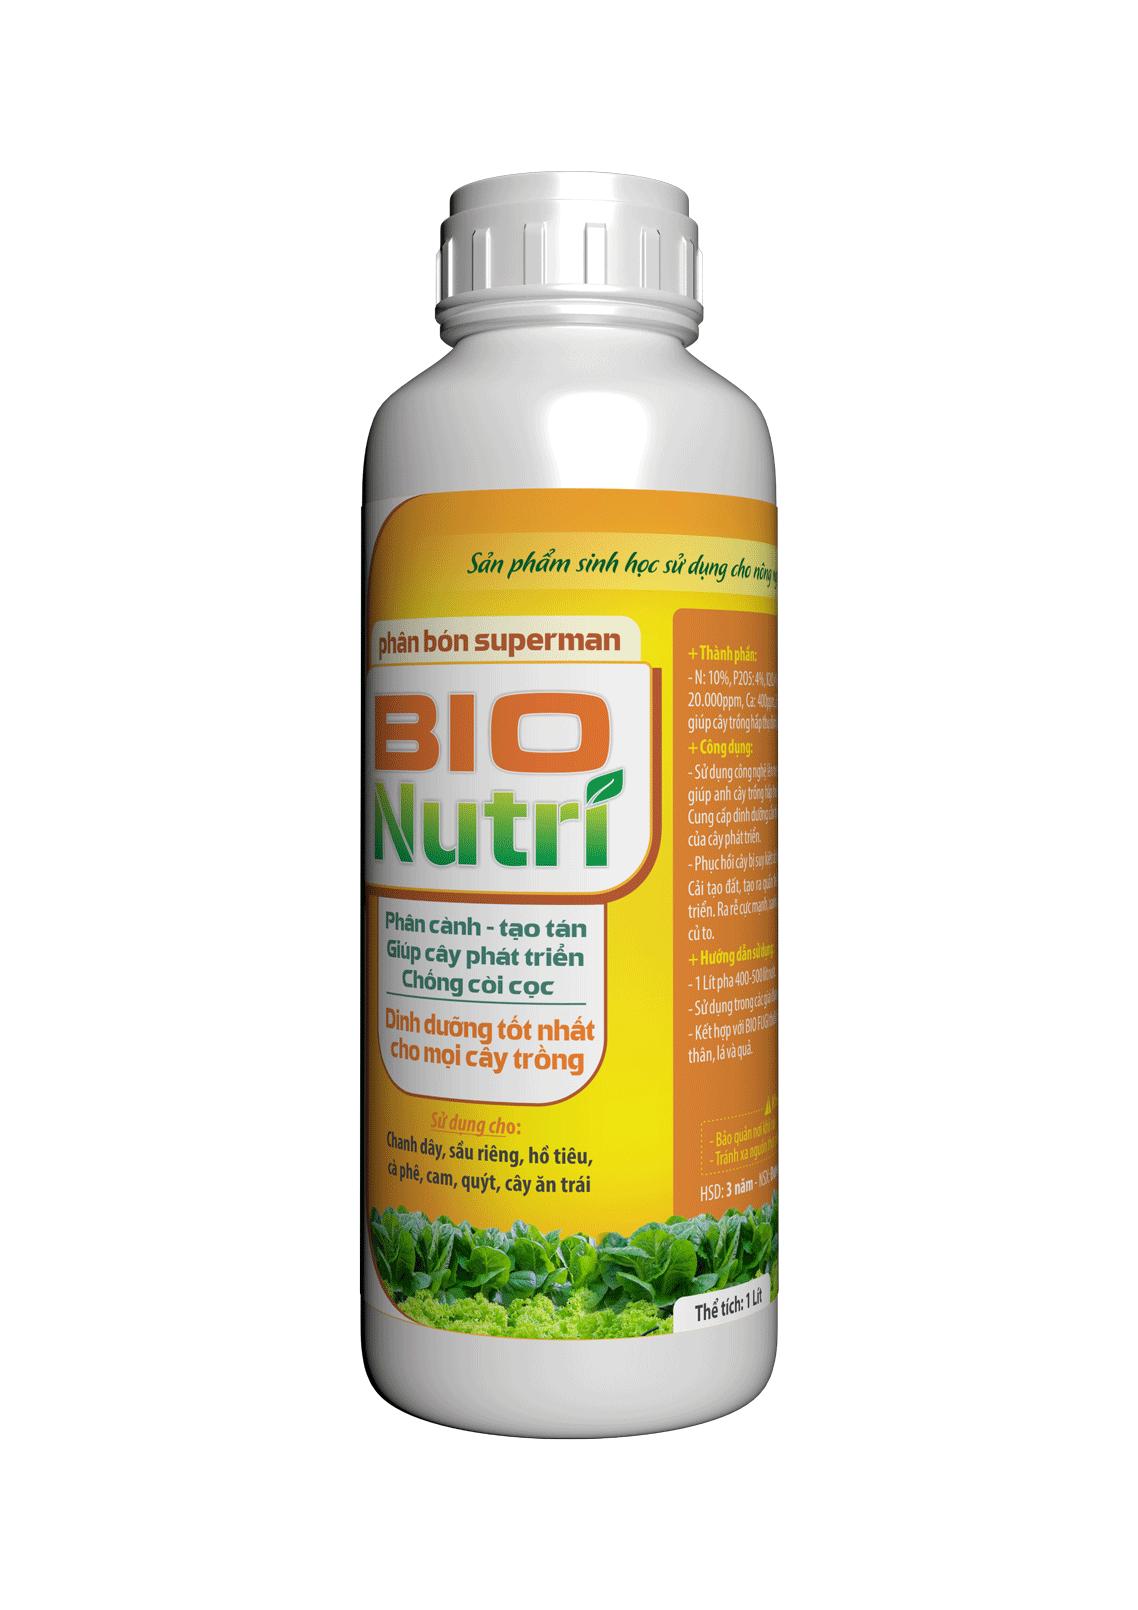 Phân bón cây trồng - BIO NUTRI